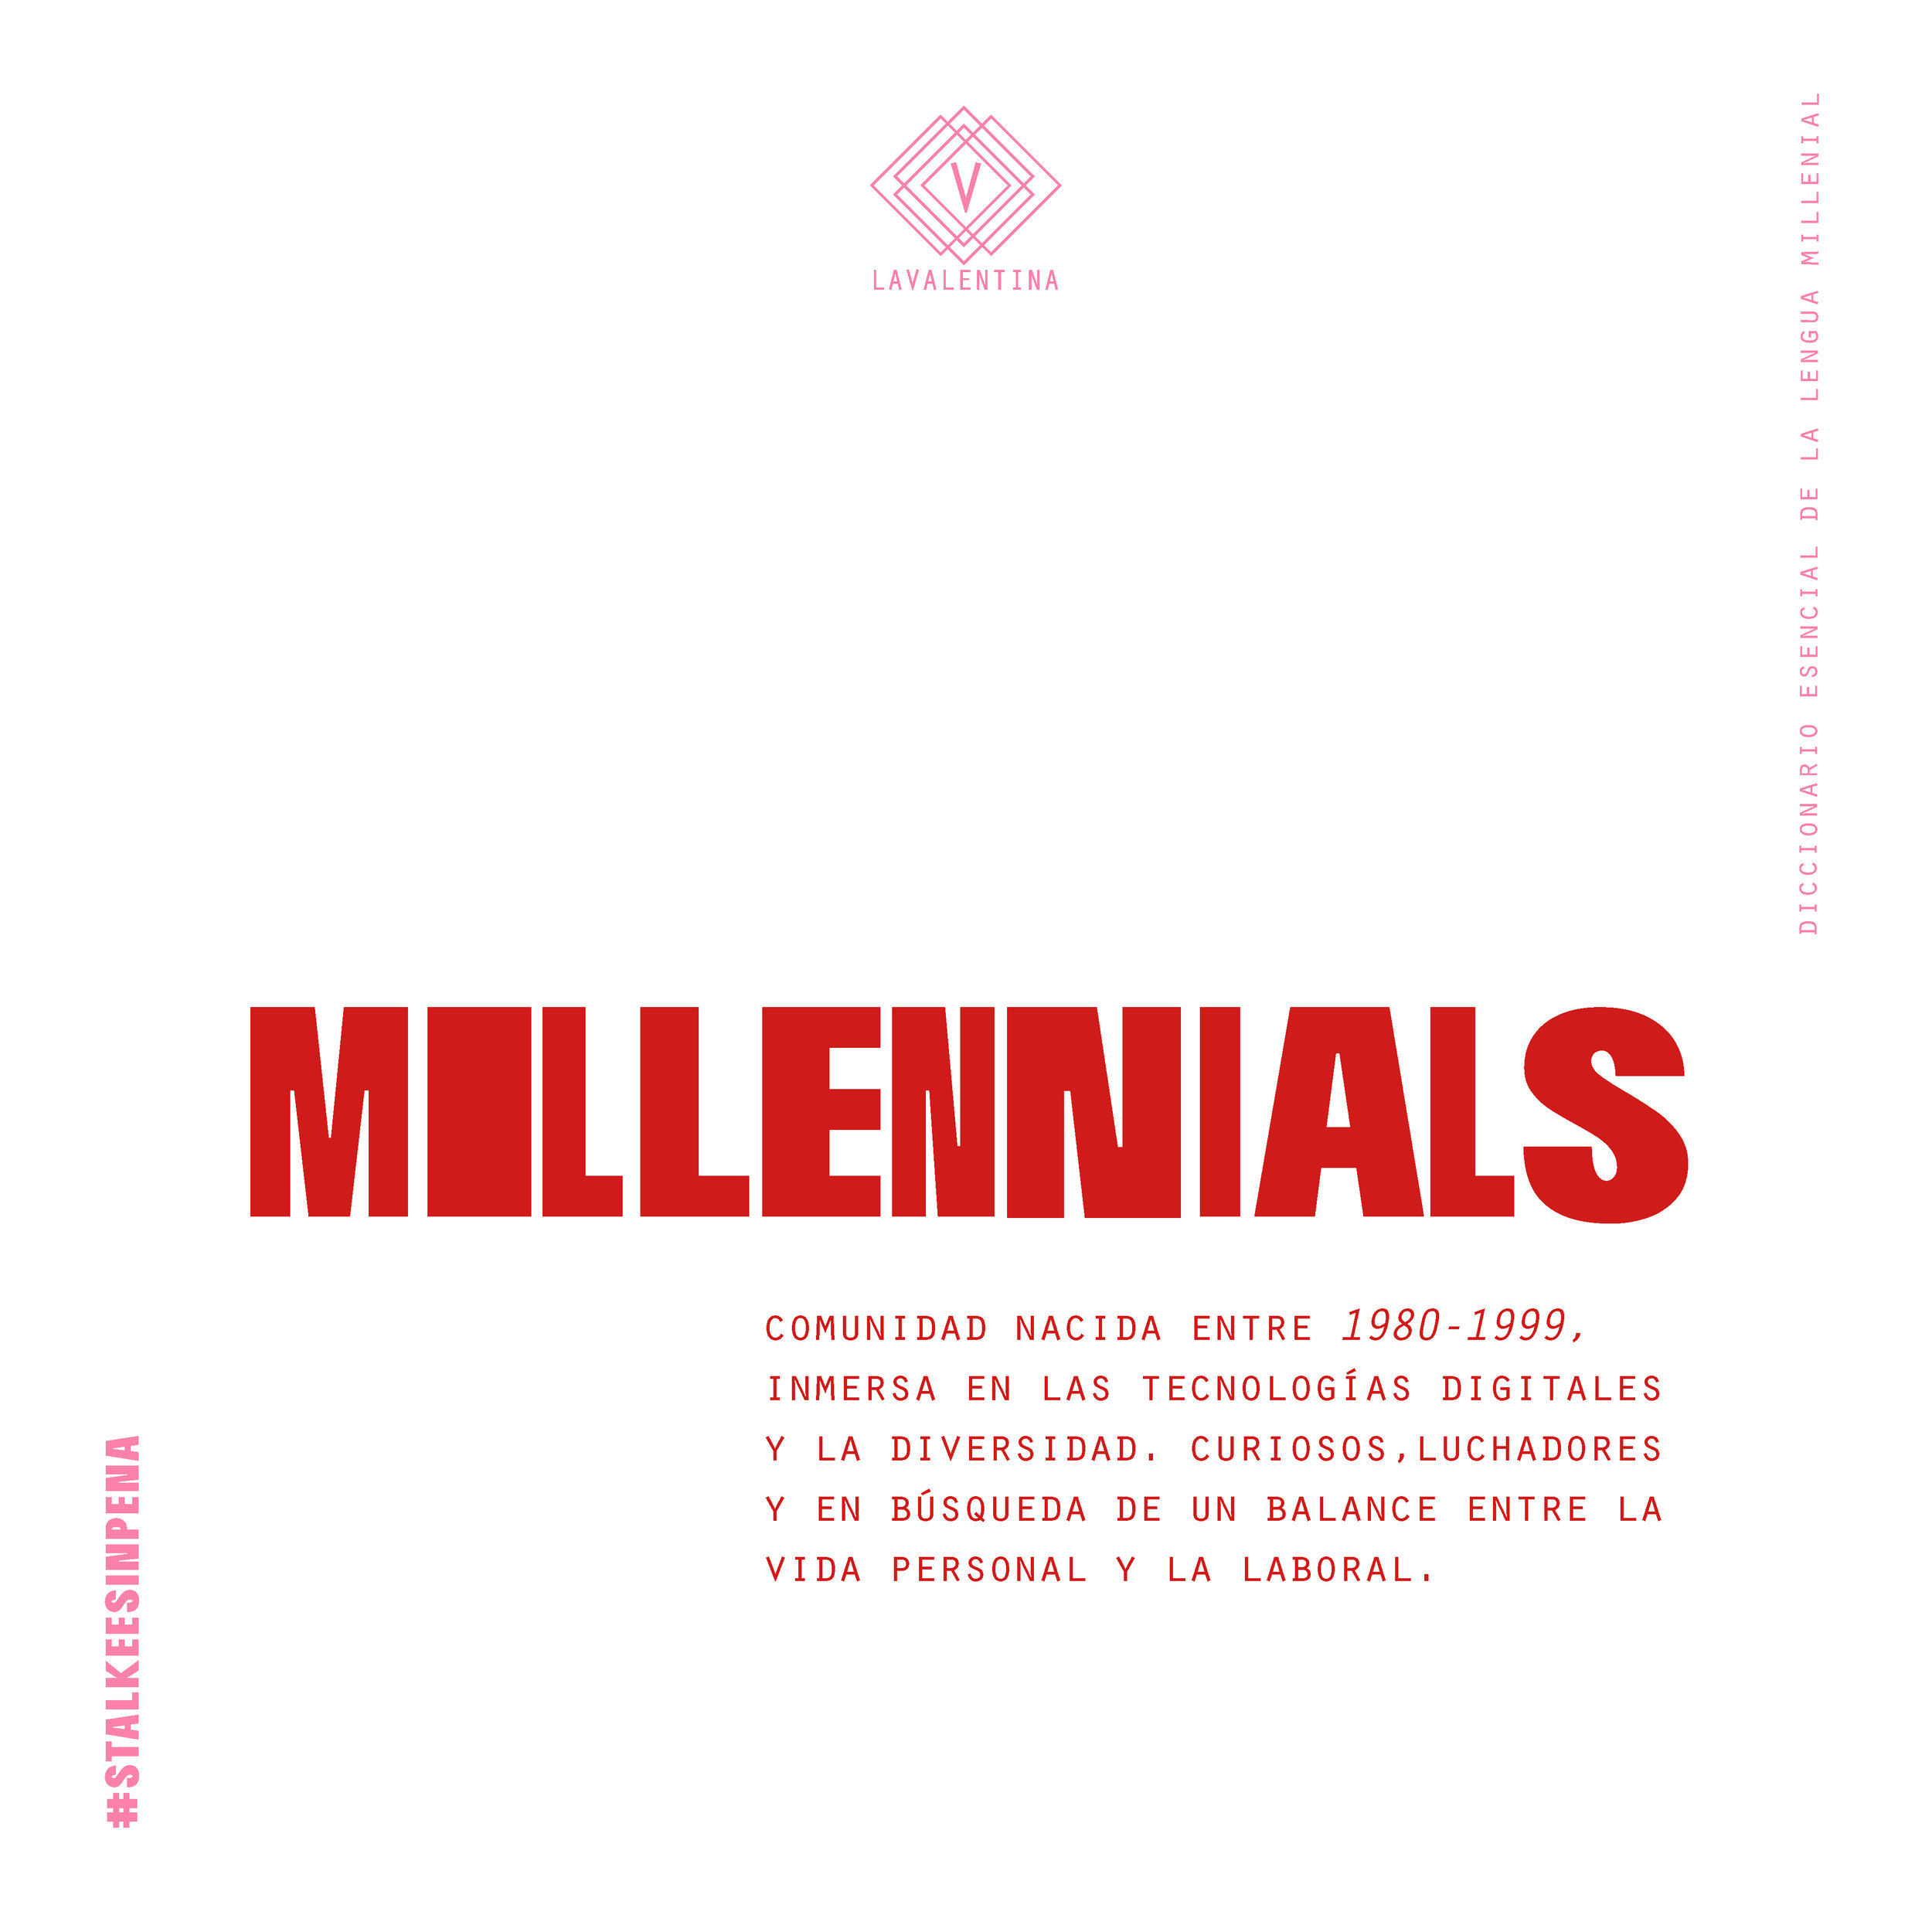 Millenialspost-05.jpg